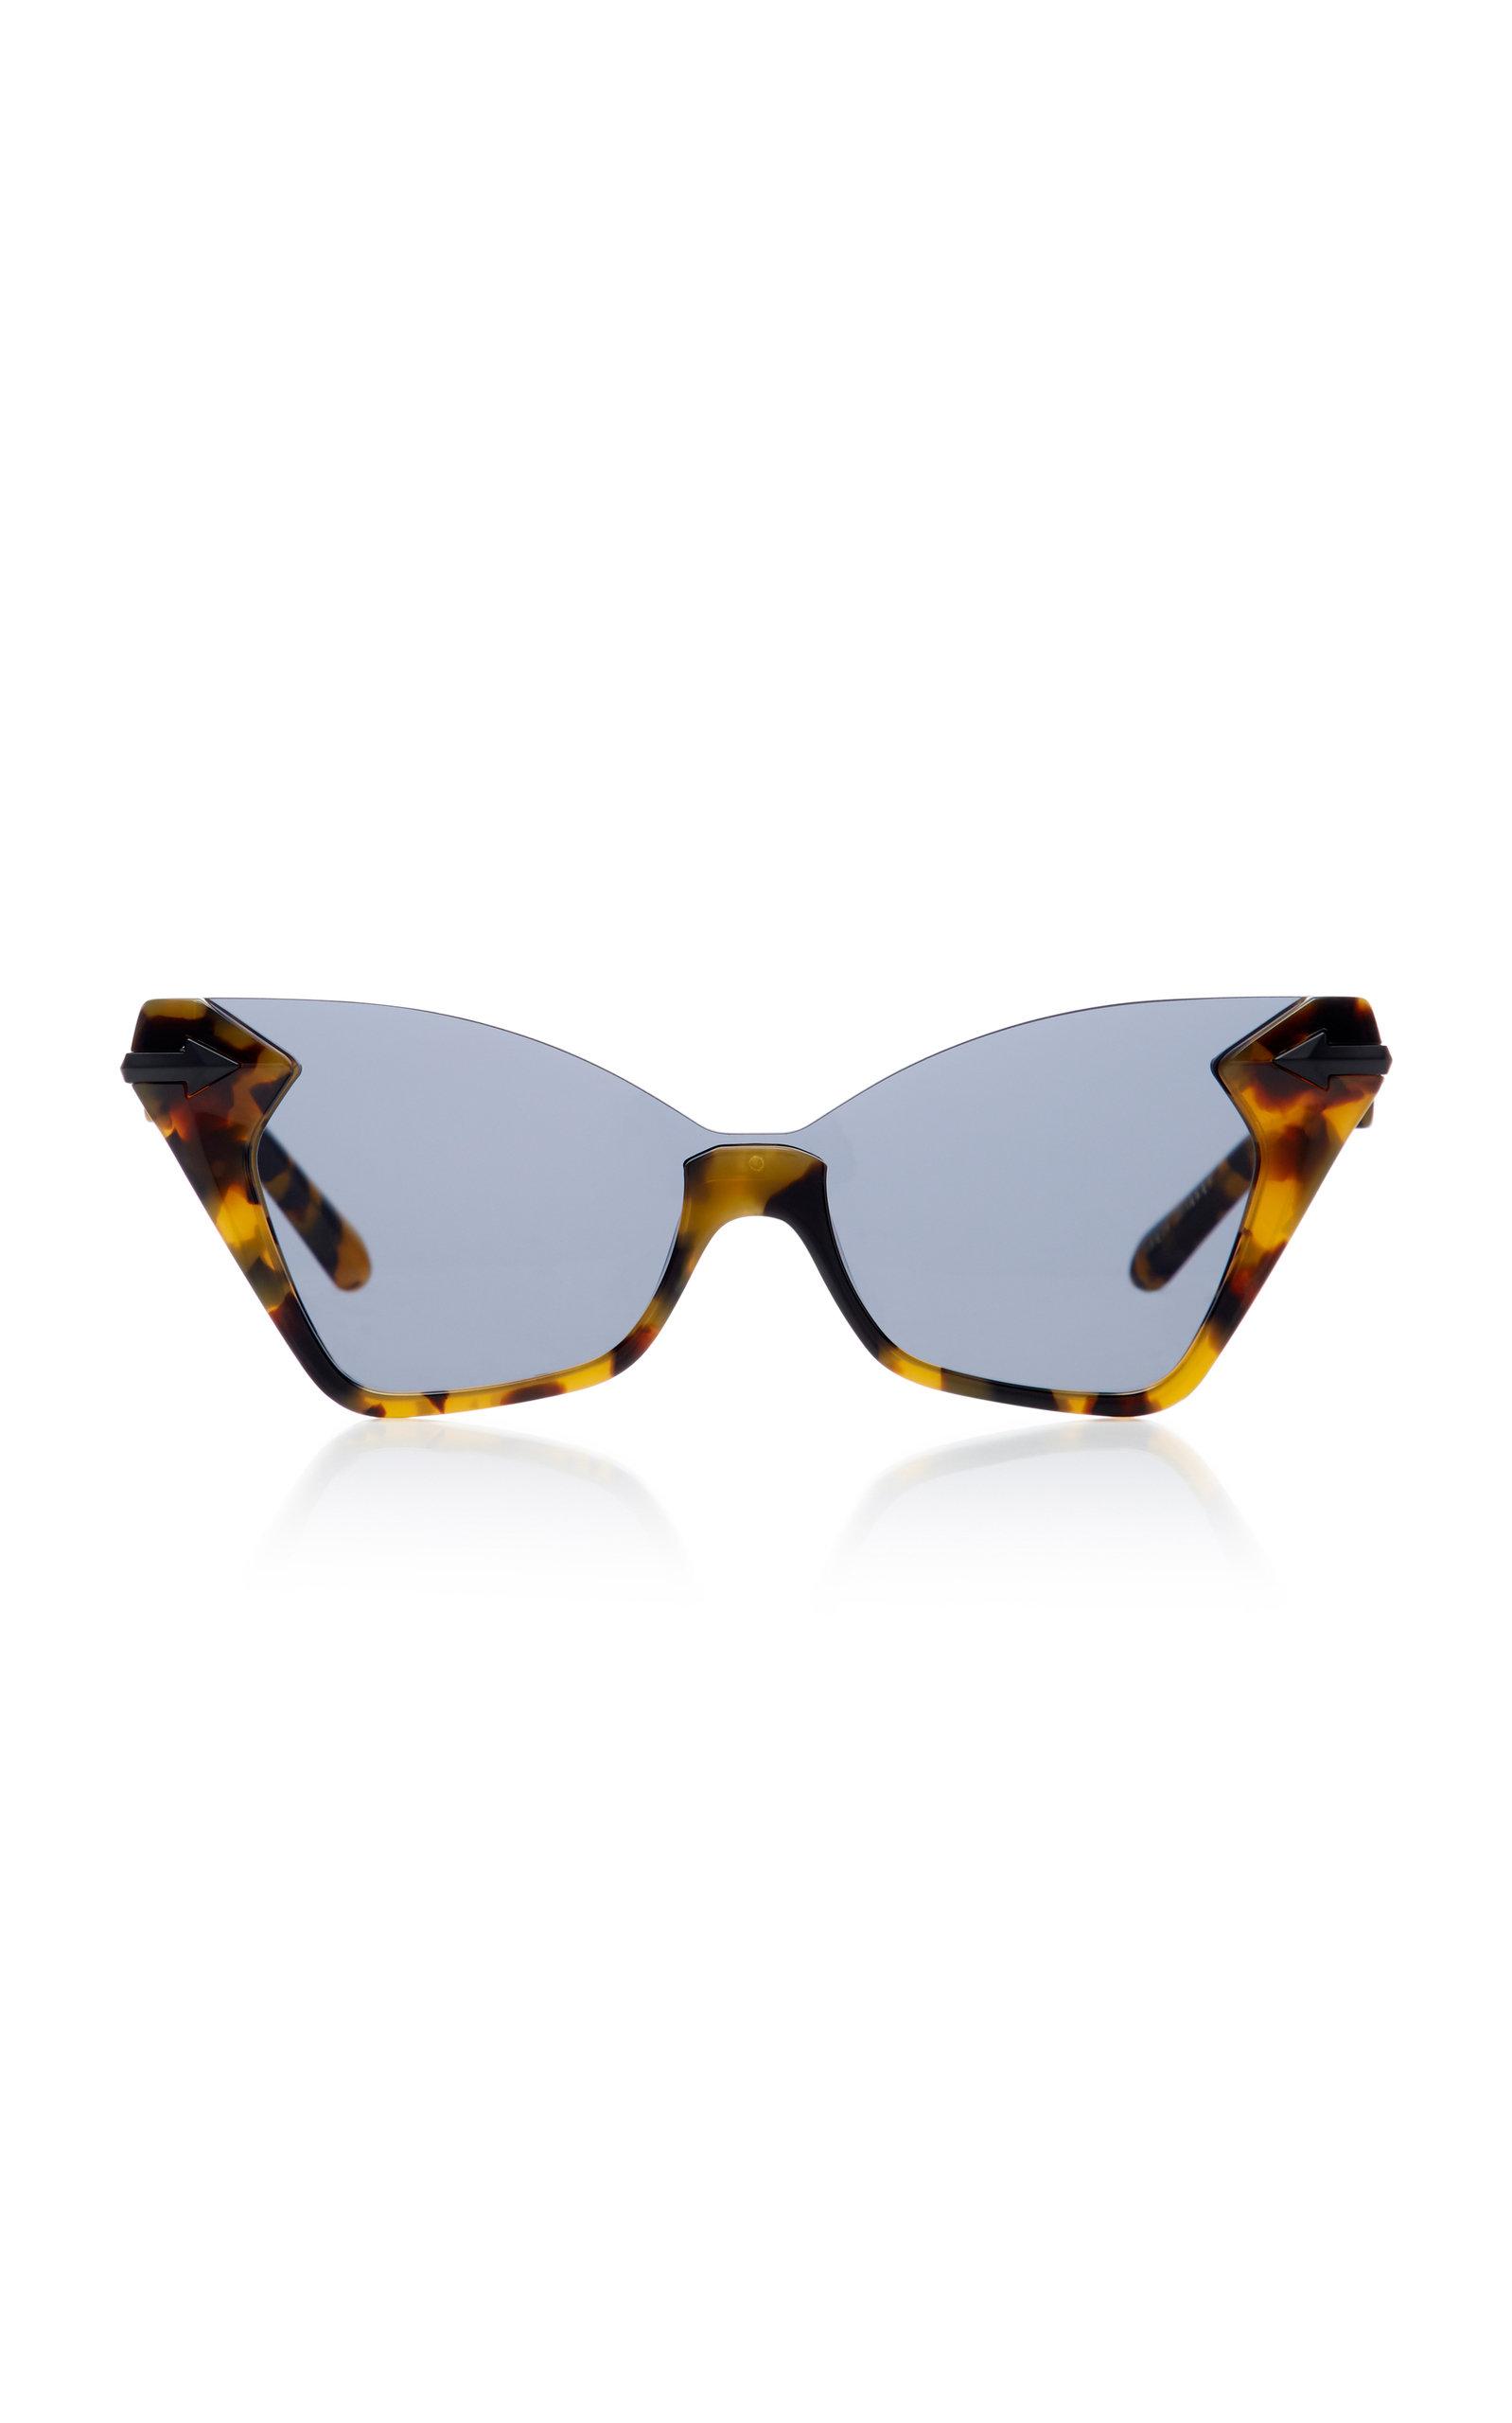 bc4289b5caf3 Sweet Cat Sunglasses by Karen Walker | Moda Operandi